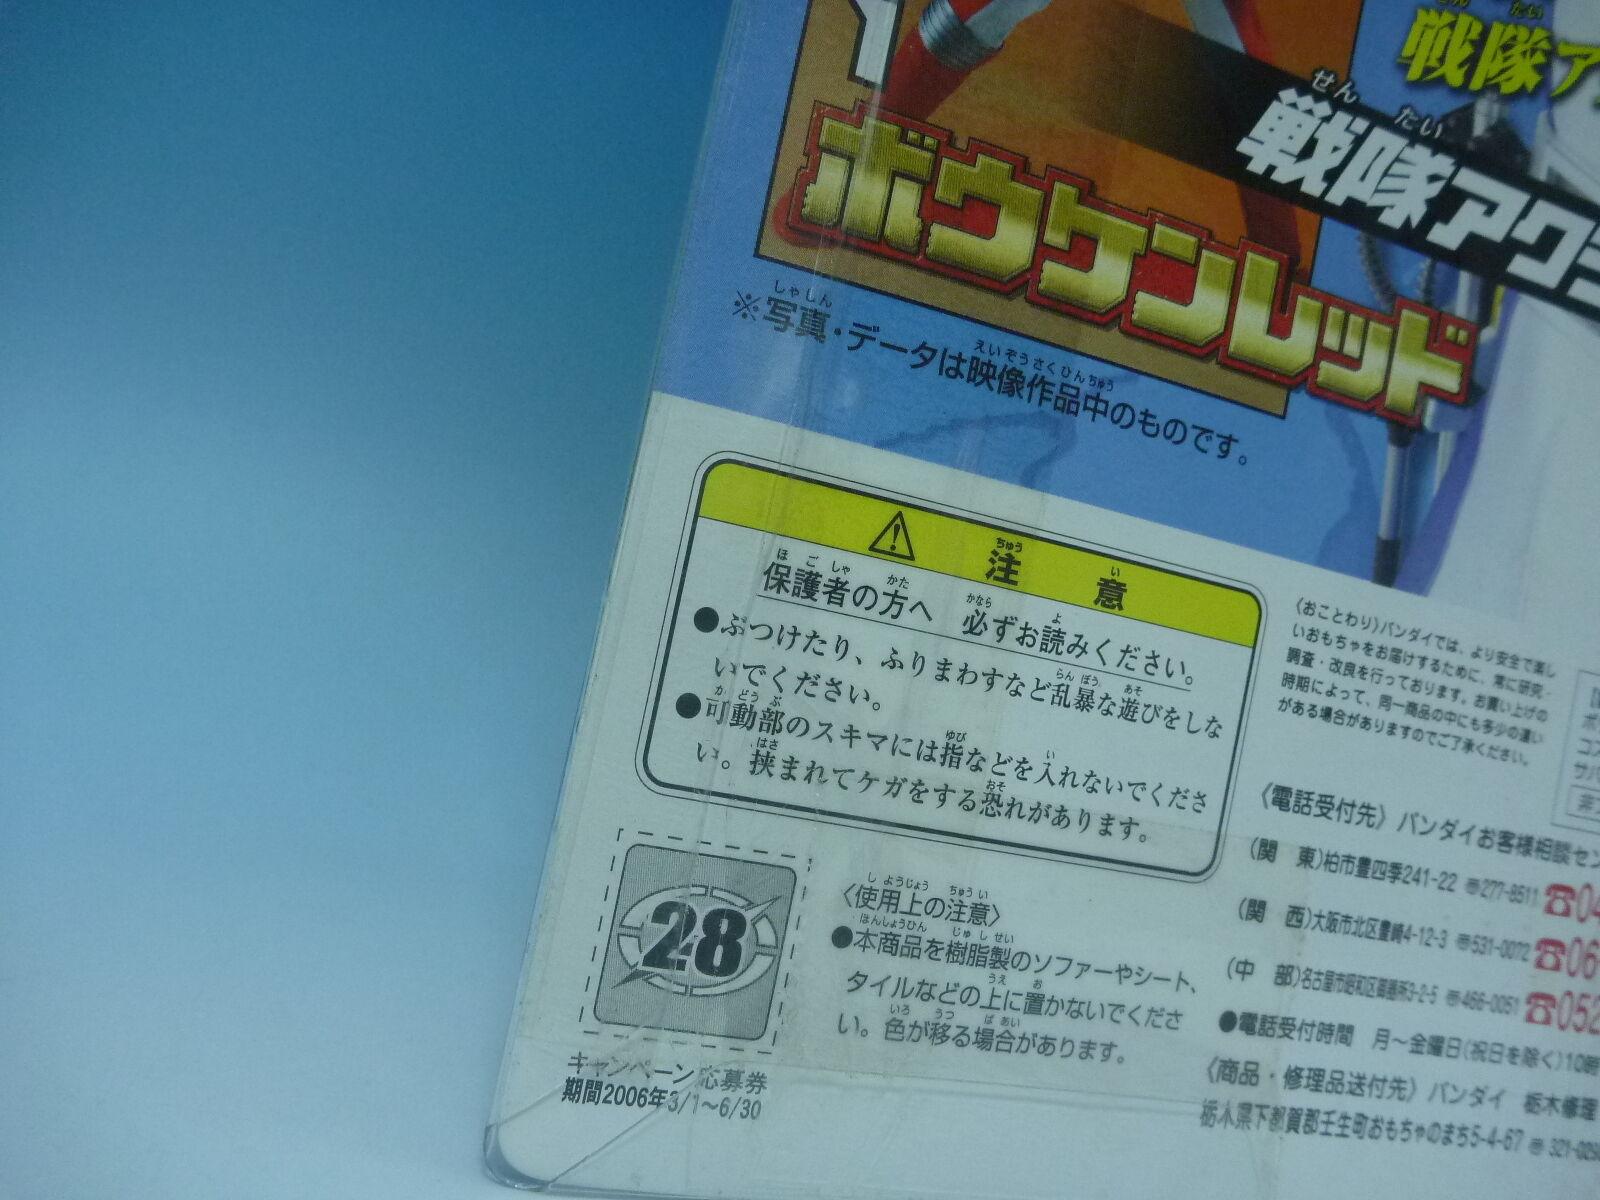 BANDAI Power Rangers Rangers Rangers Operation Overdrive BOUKENblueE Action Figure EMS from JAPAN 4a80f0